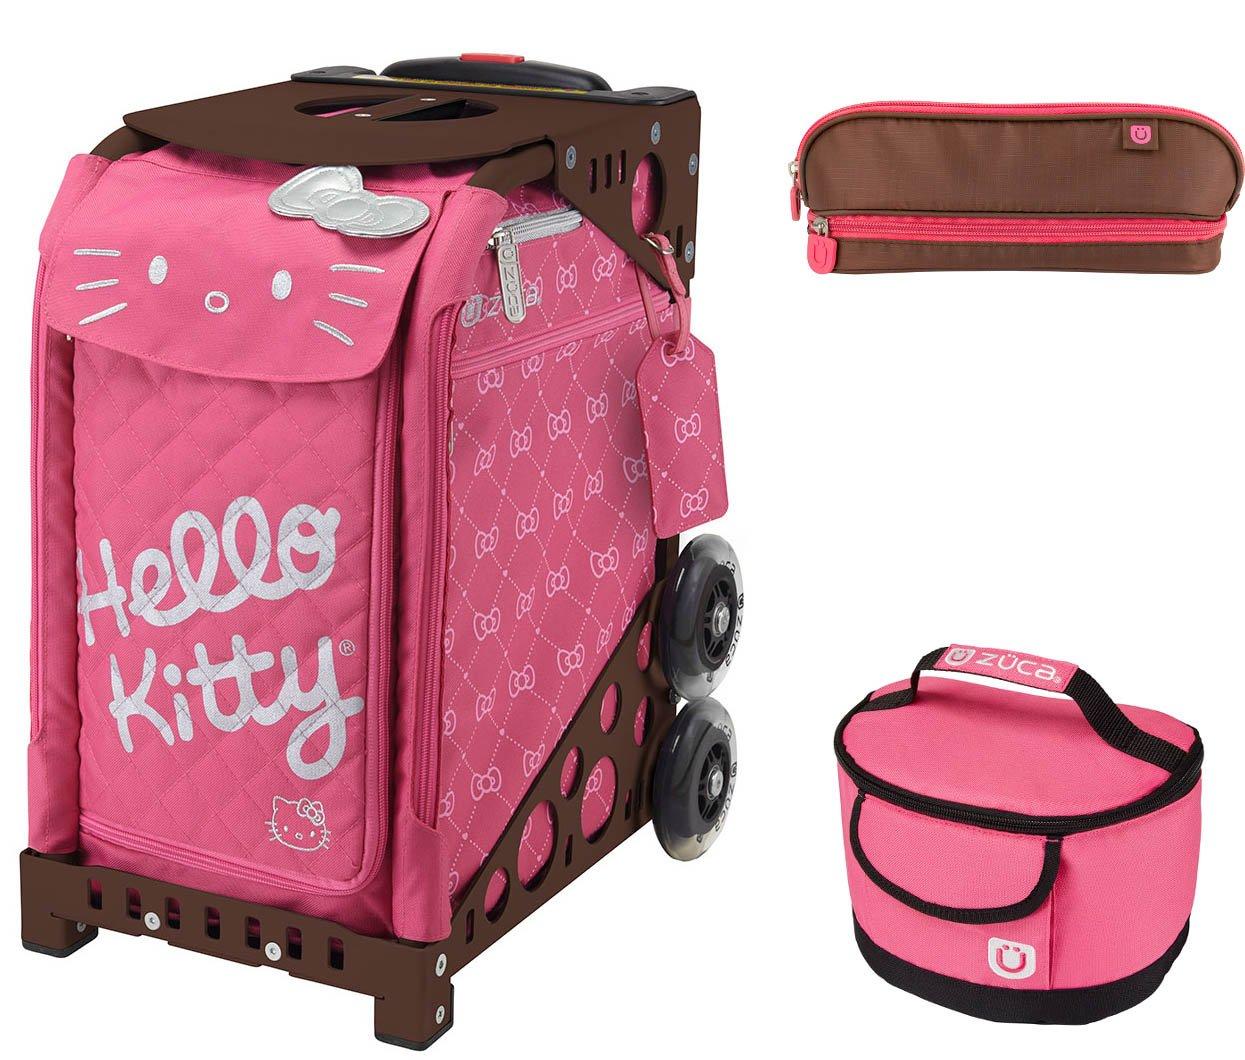 Zuca ハローキティ ピンク ルクスバッグ ブラウン スポーツフレーム ランチボックスとペンケース付き